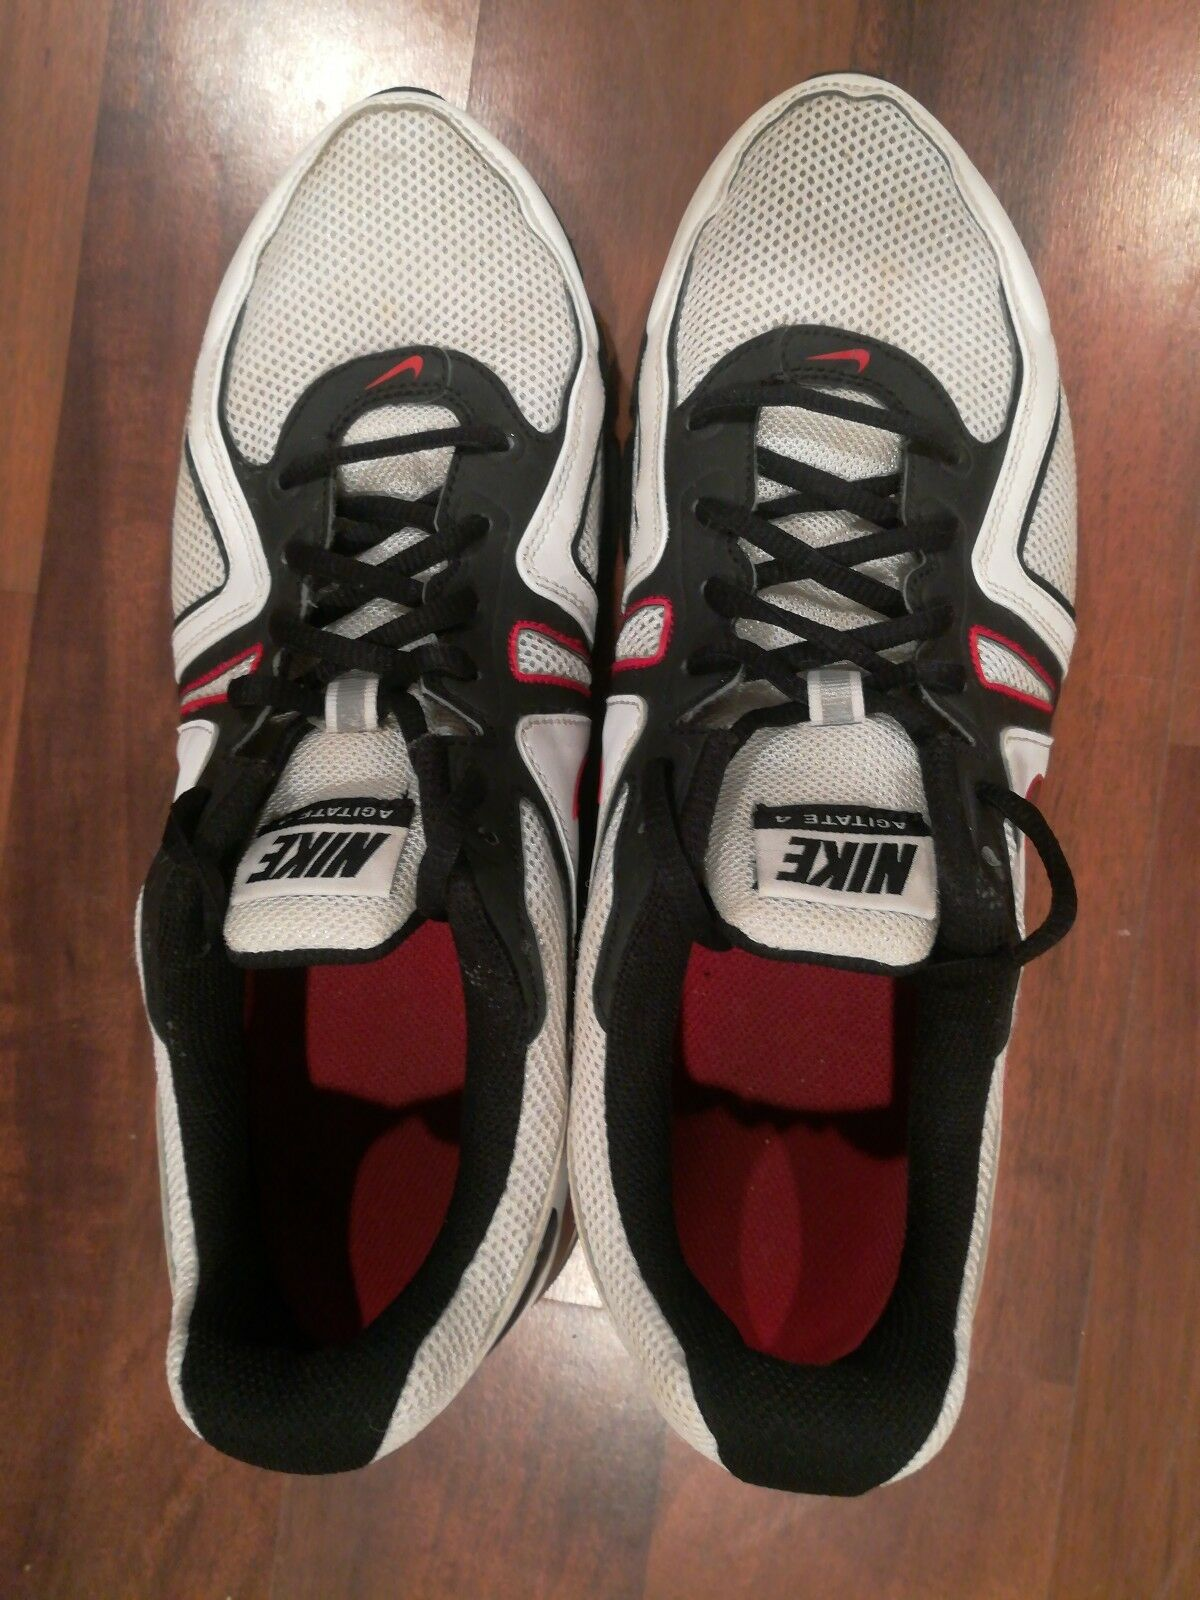 Nike Air Max Agitate 4 Men's Running Shoes Whiteblackred Size 10.5